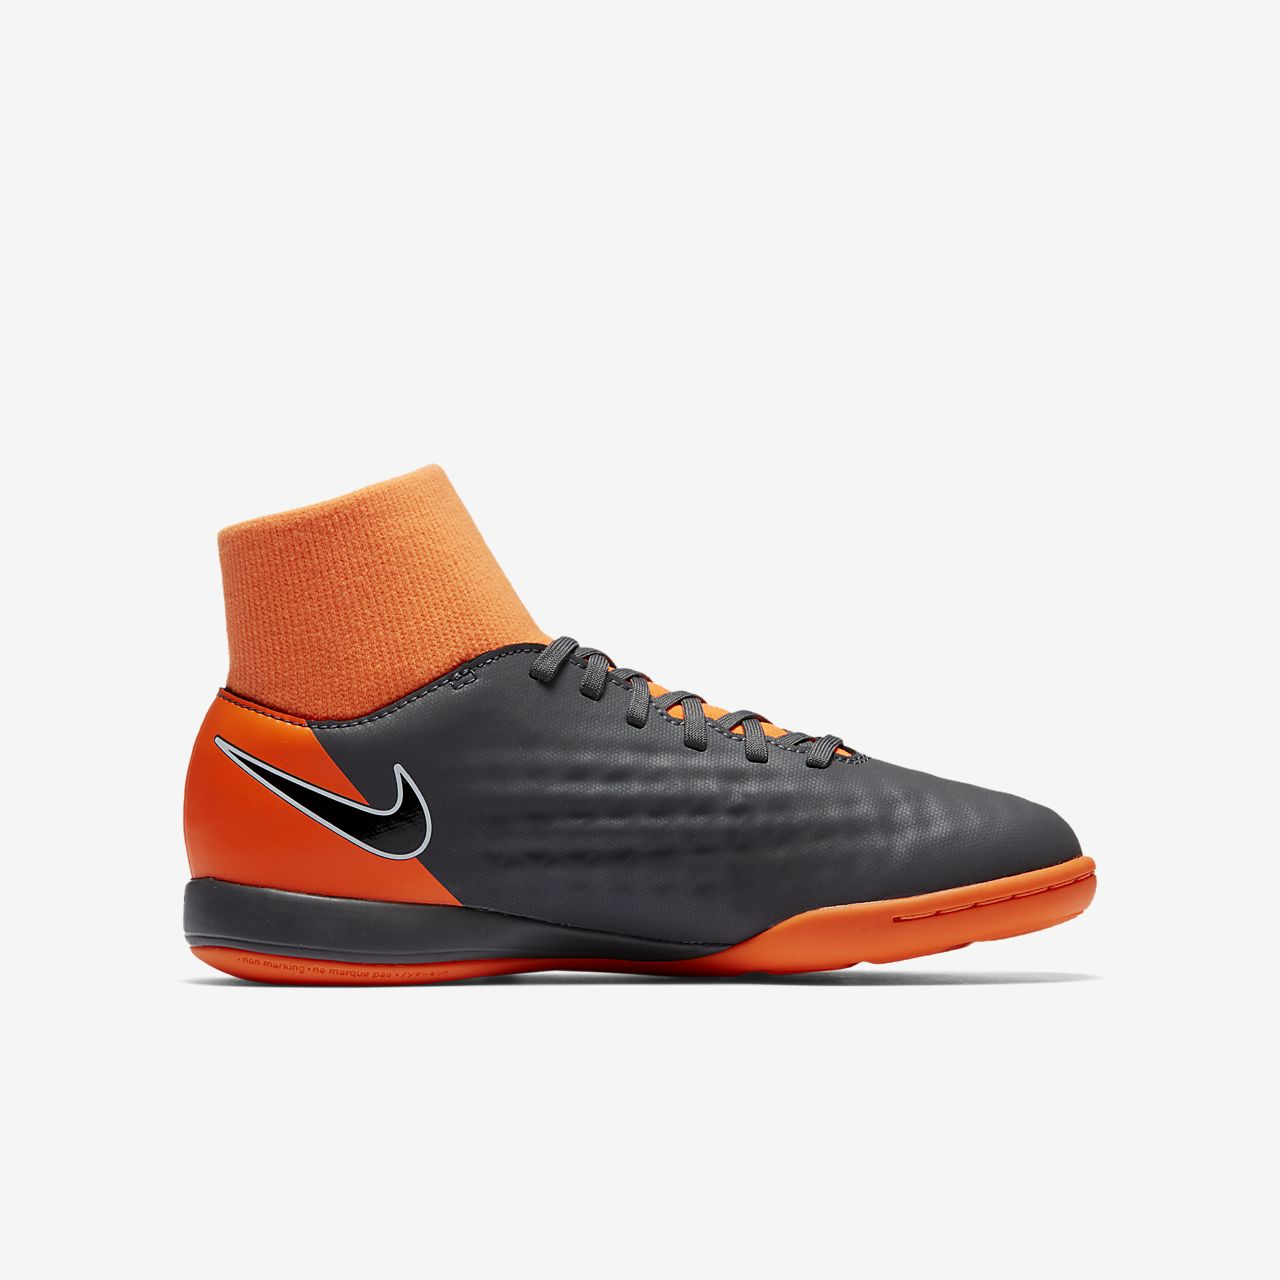 ... Nike Jr. Magista ObraX II Academy Dynamic Fit IC Little/Big Kids' Indoor